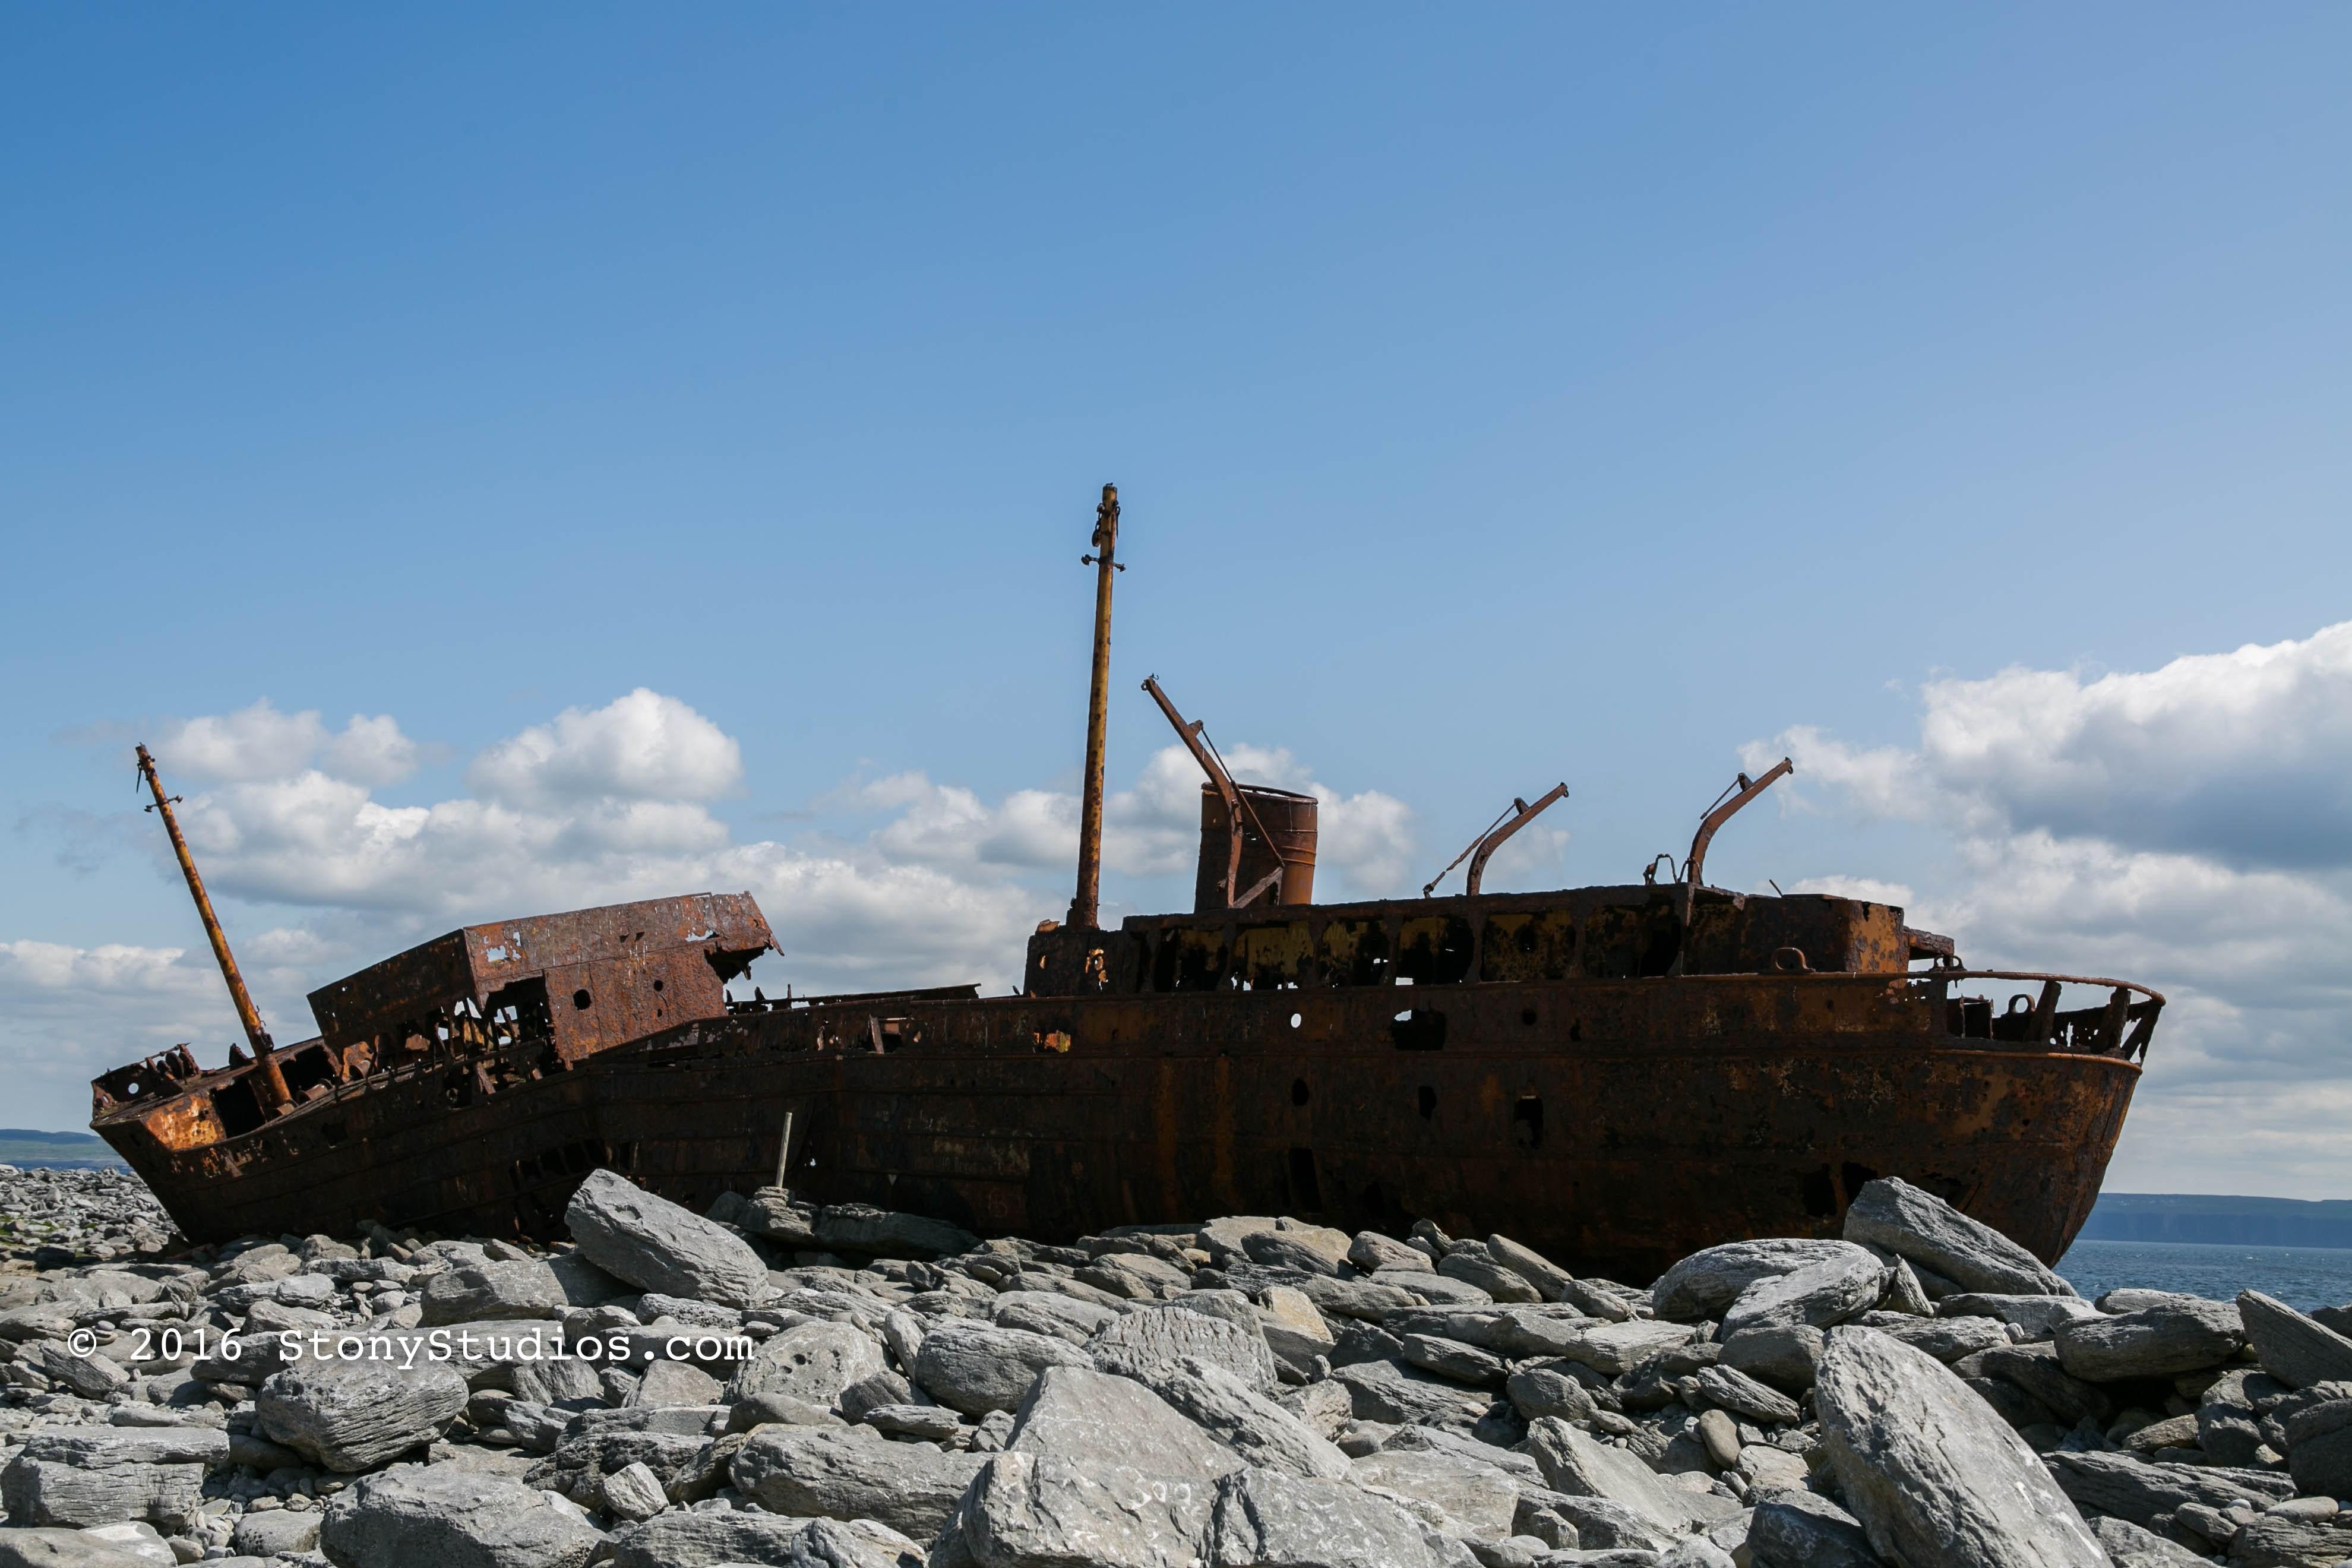 Stony Studios » The Plassey Shipwreck, Inis Oírr